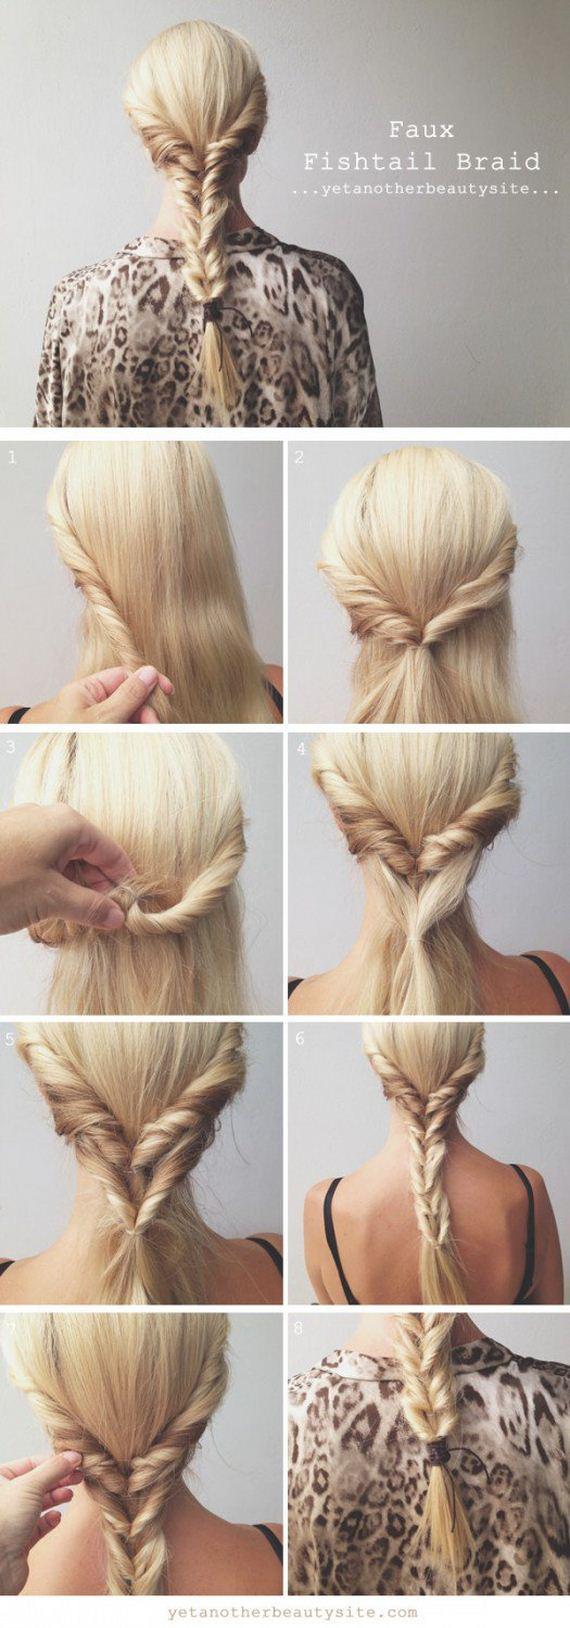 14-DIY-Hairstyles-for-Long-Hair